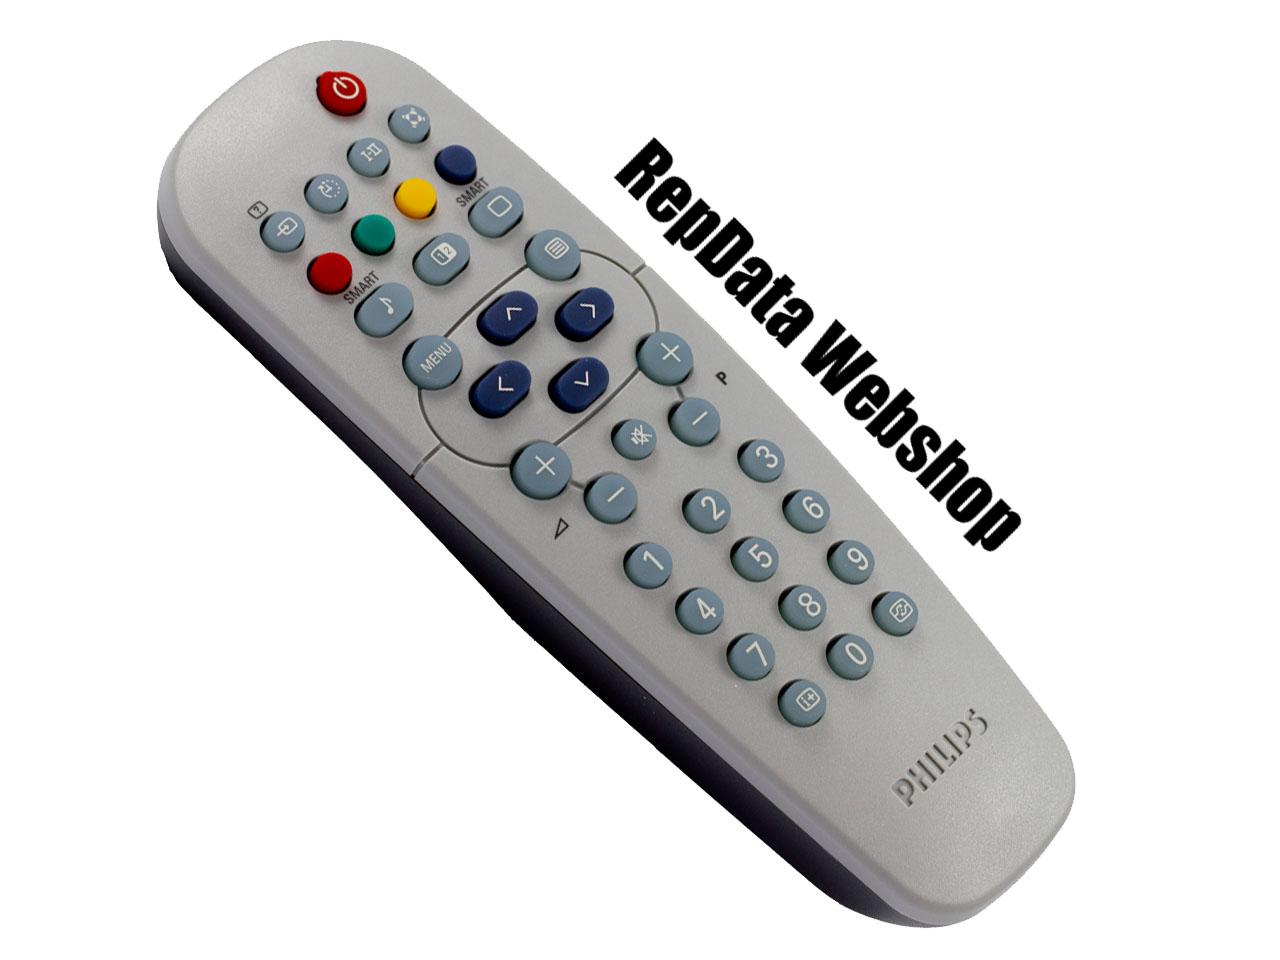 rc19335023 original philips remote control rc19335023 01. Black Bedroom Furniture Sets. Home Design Ideas